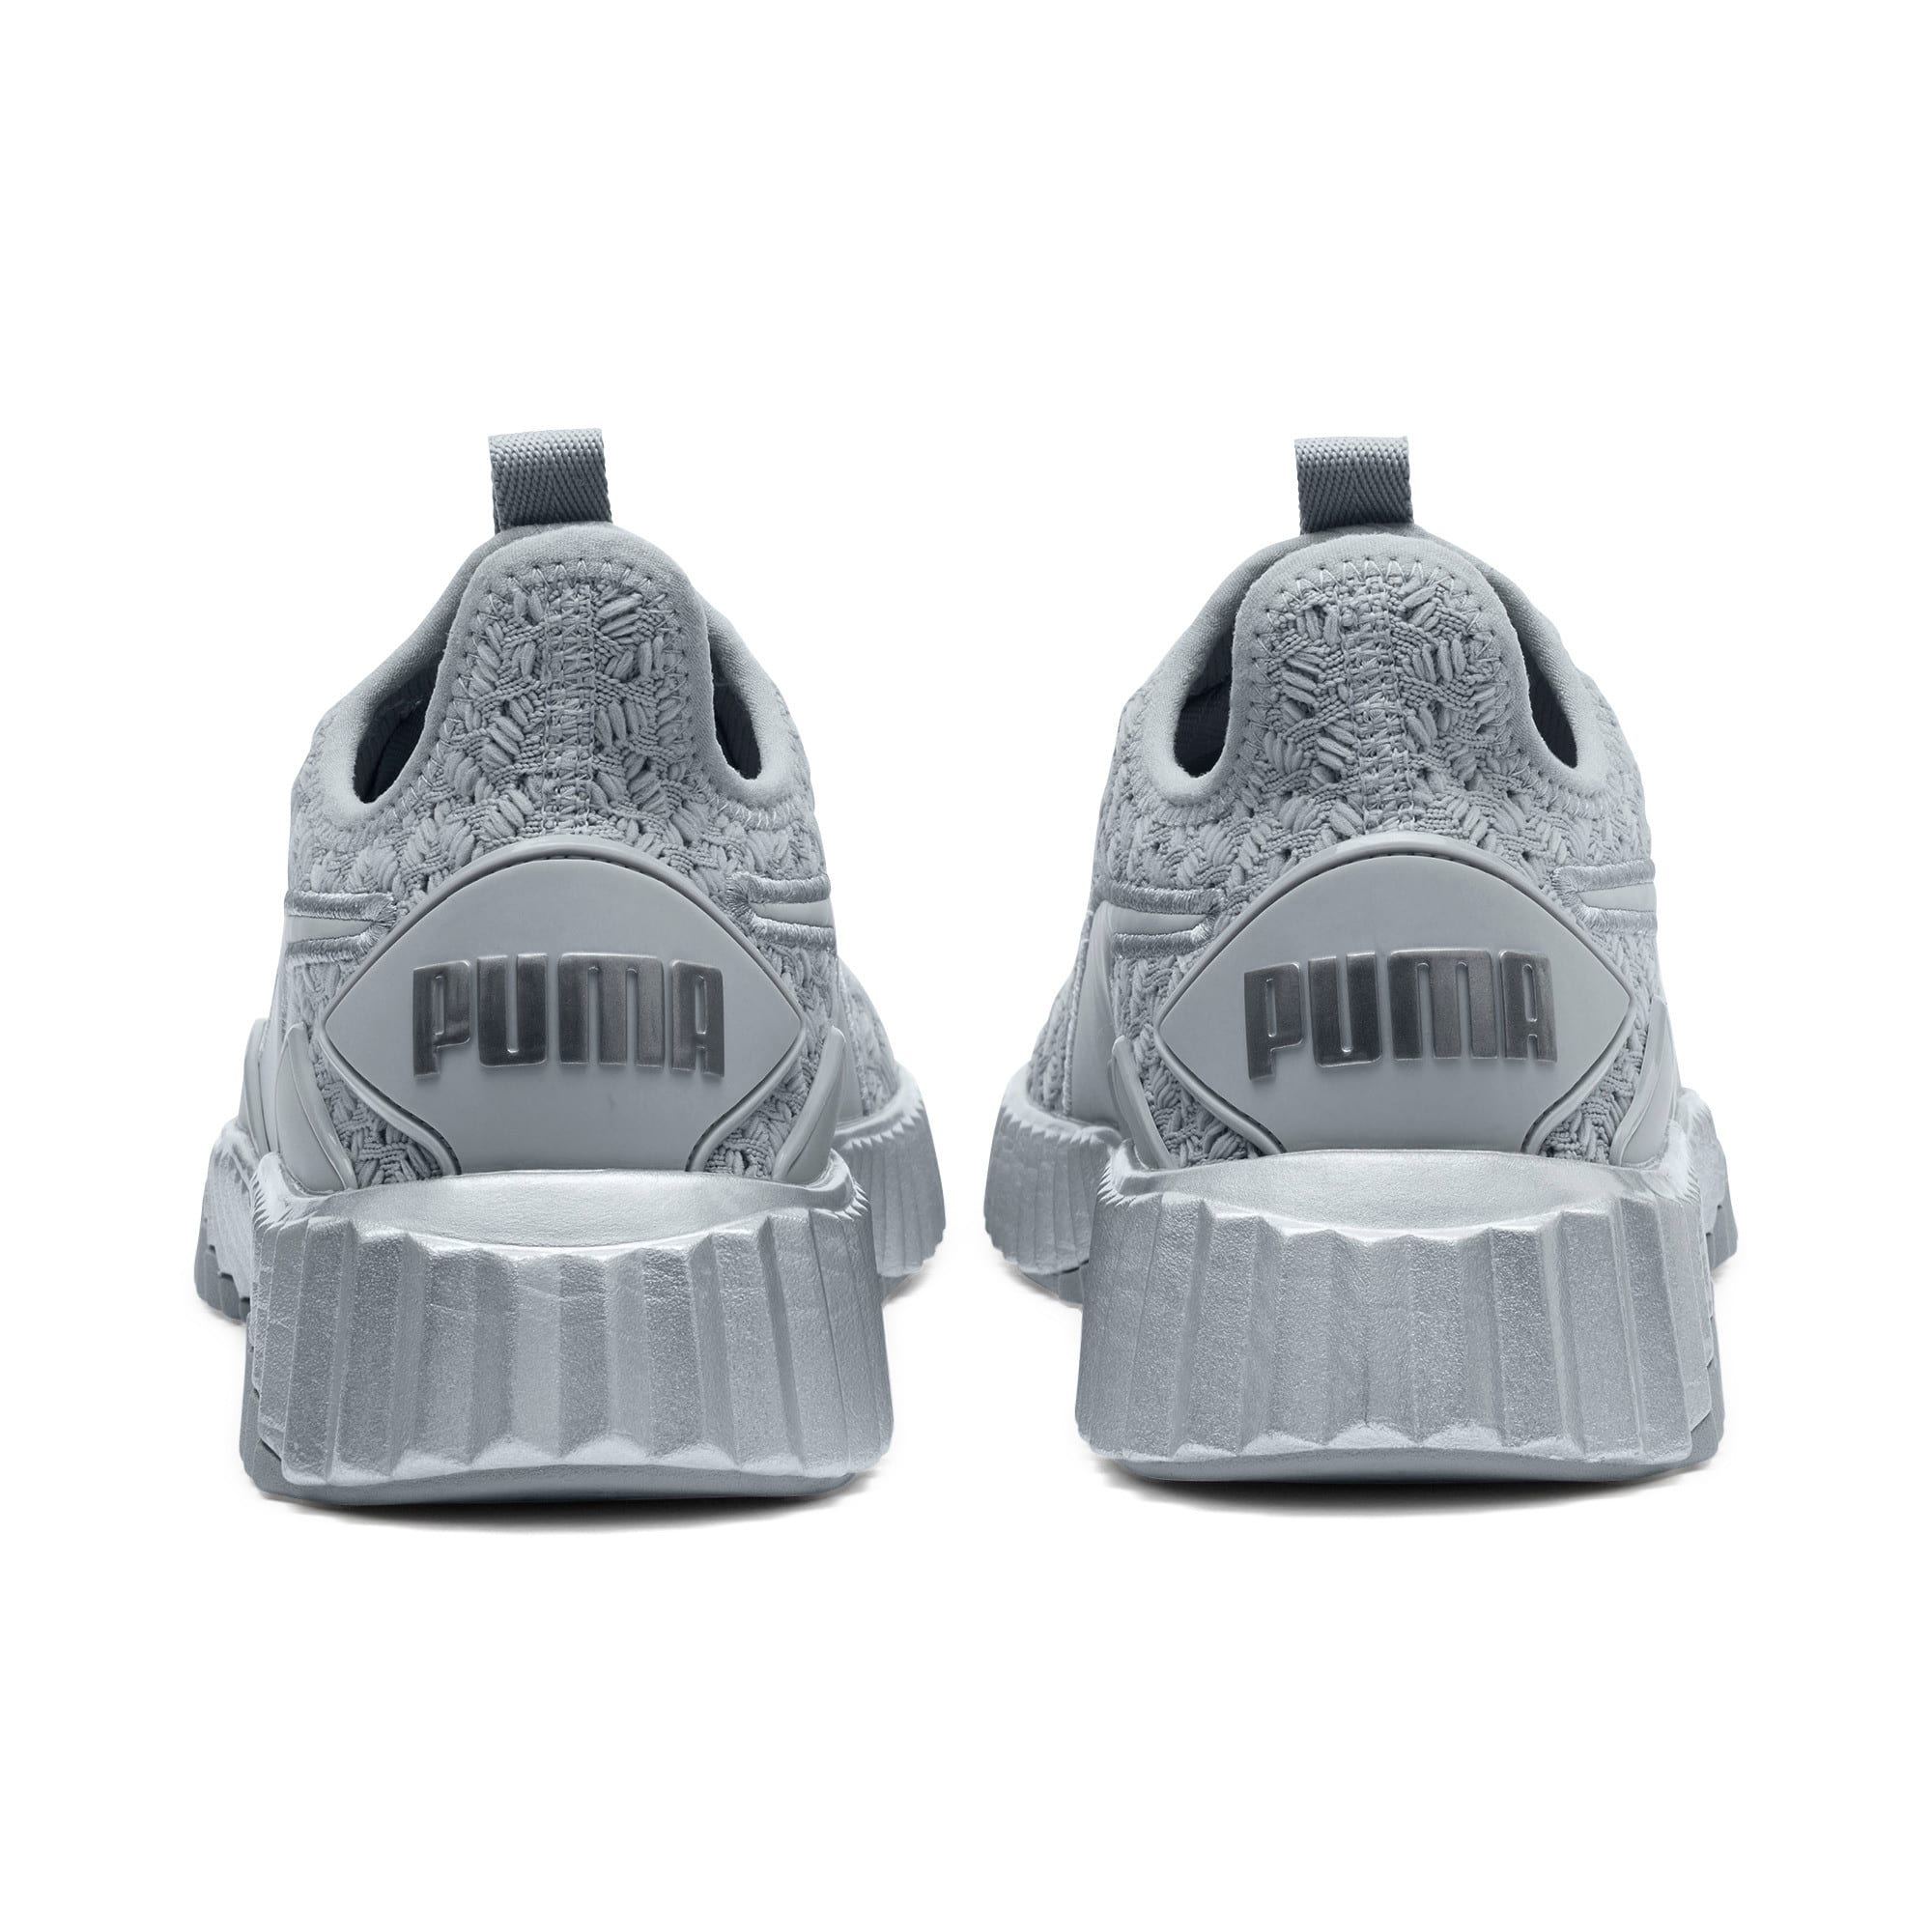 Thumbnail 4 of Defy Sparkle Women's Training Shoes, Quarry-Puma Silver, medium